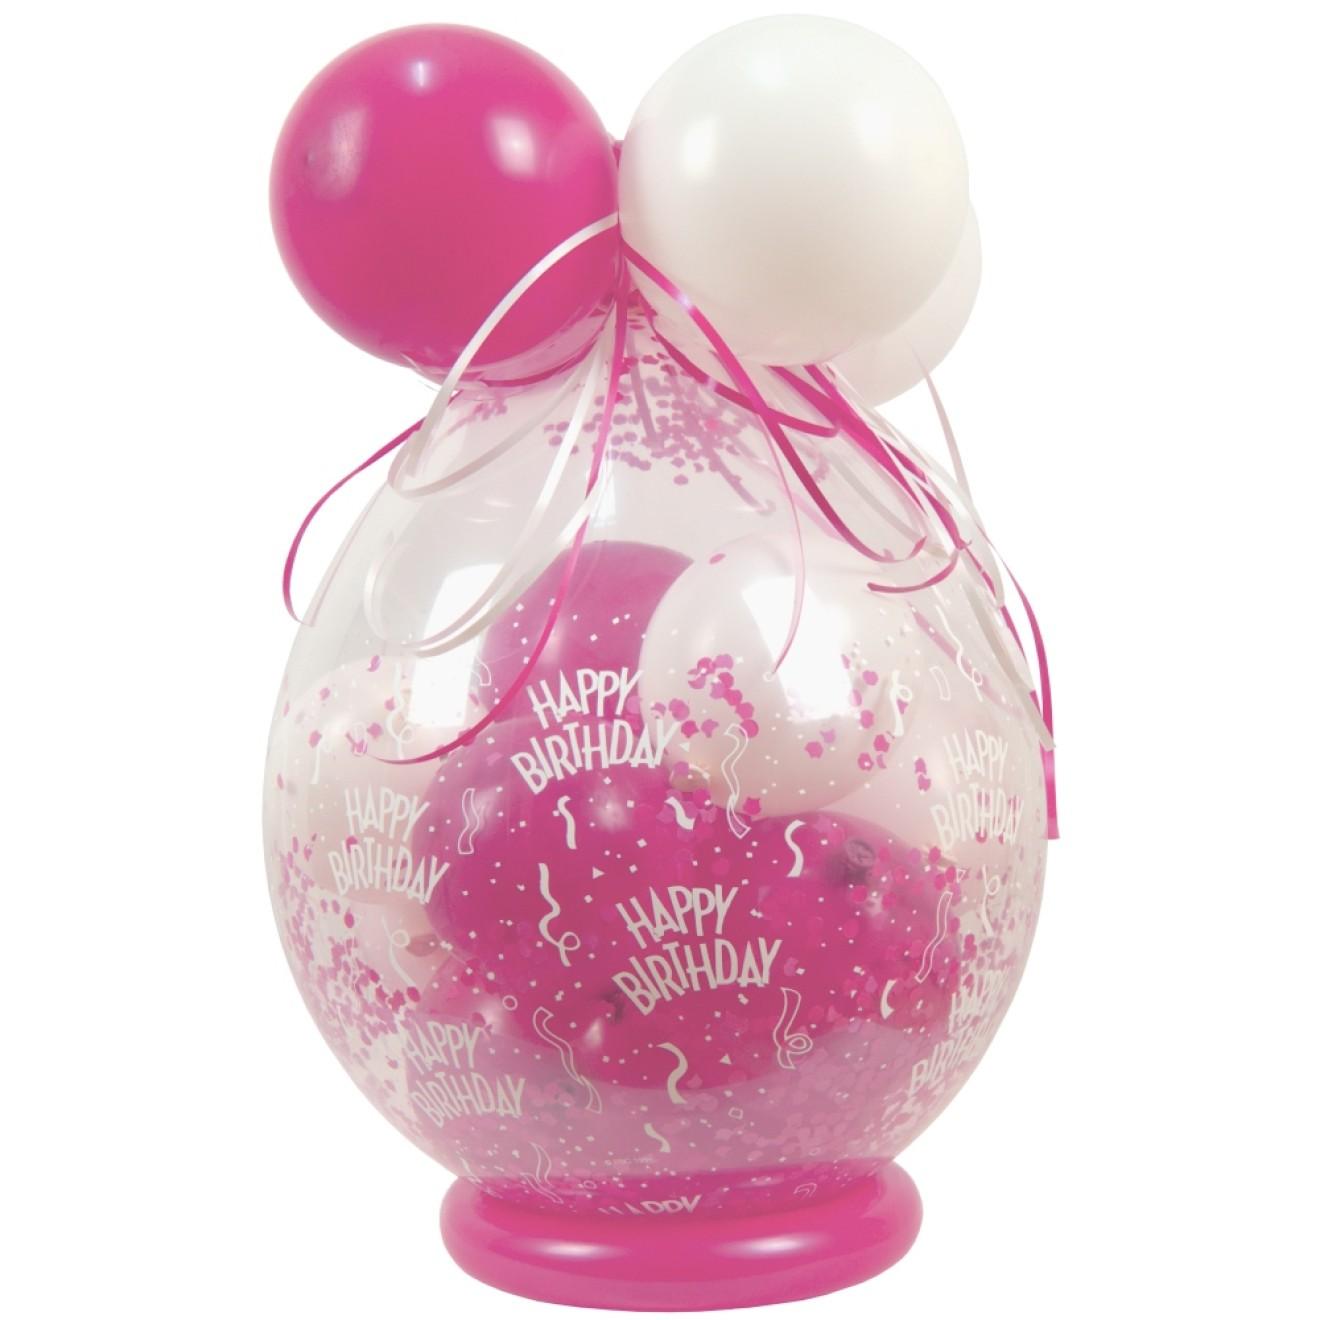 Verpackungsballon Geschenkballon Geburtstag Happy Birthday Rosa